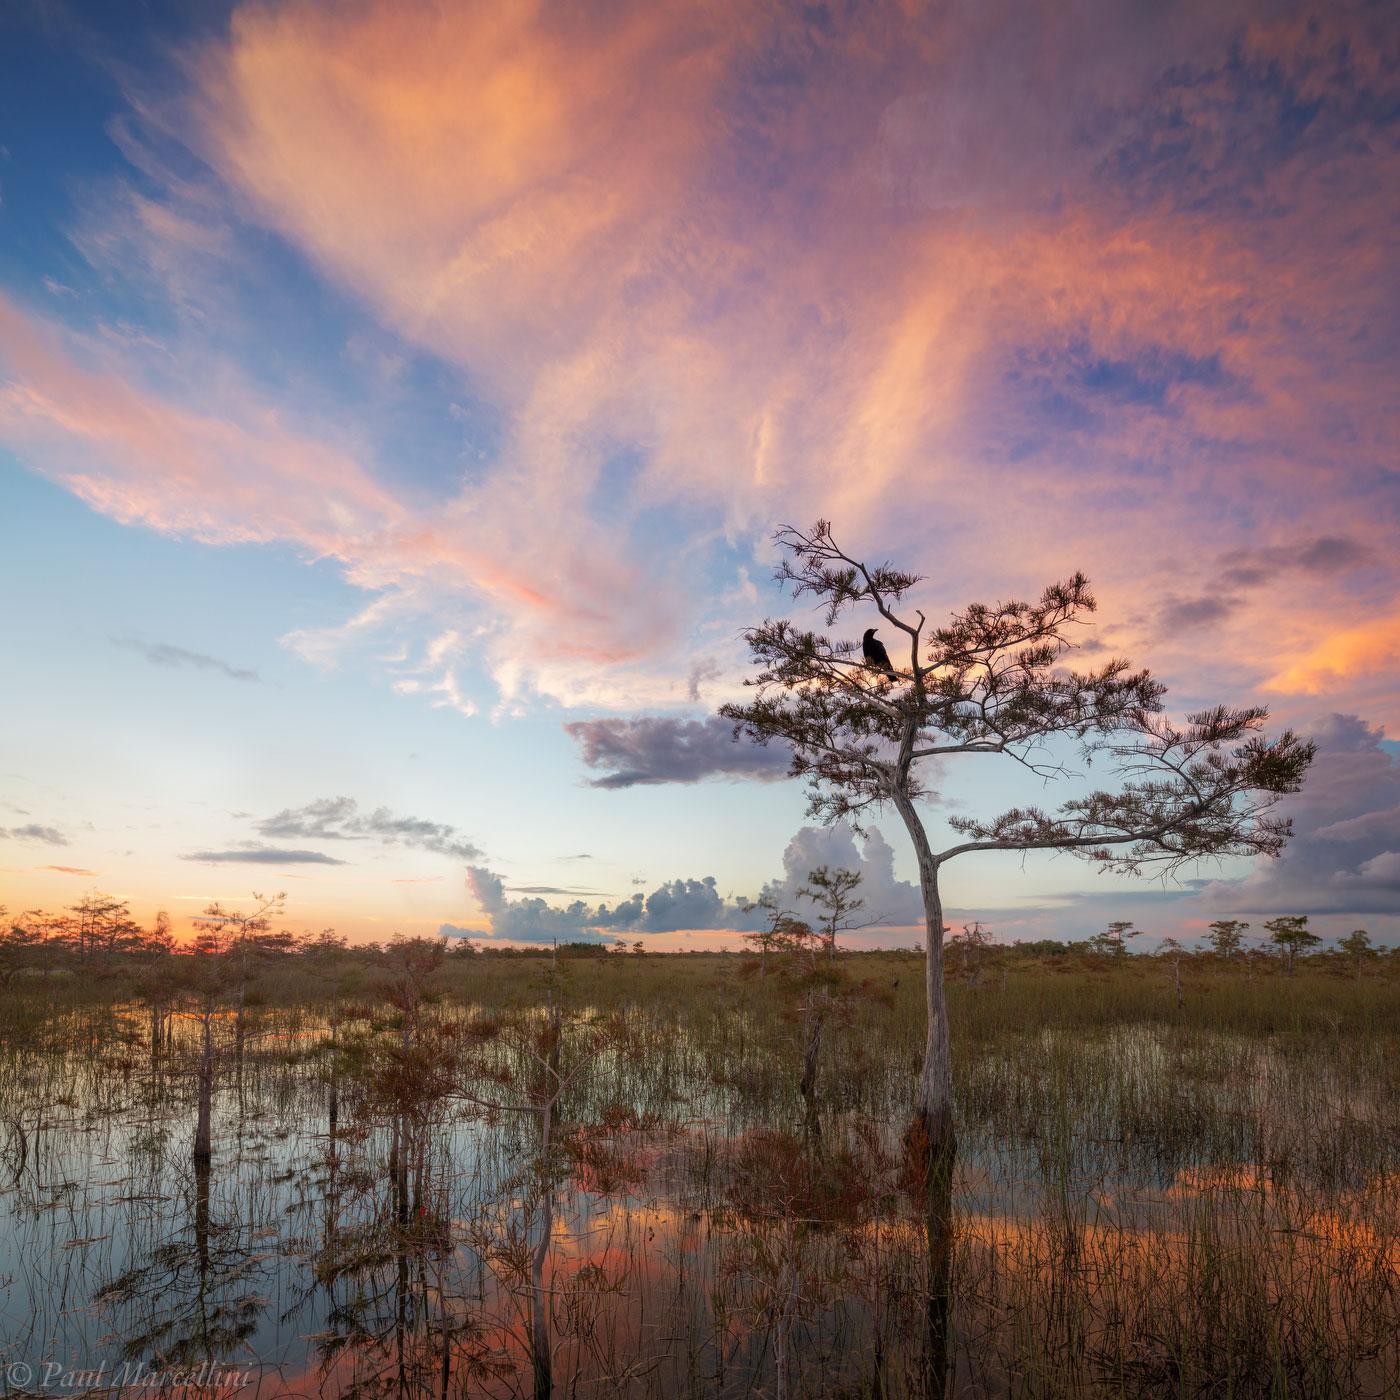 crow, everglades national park, florida, sunset, nature, photography, florida national parks, photo